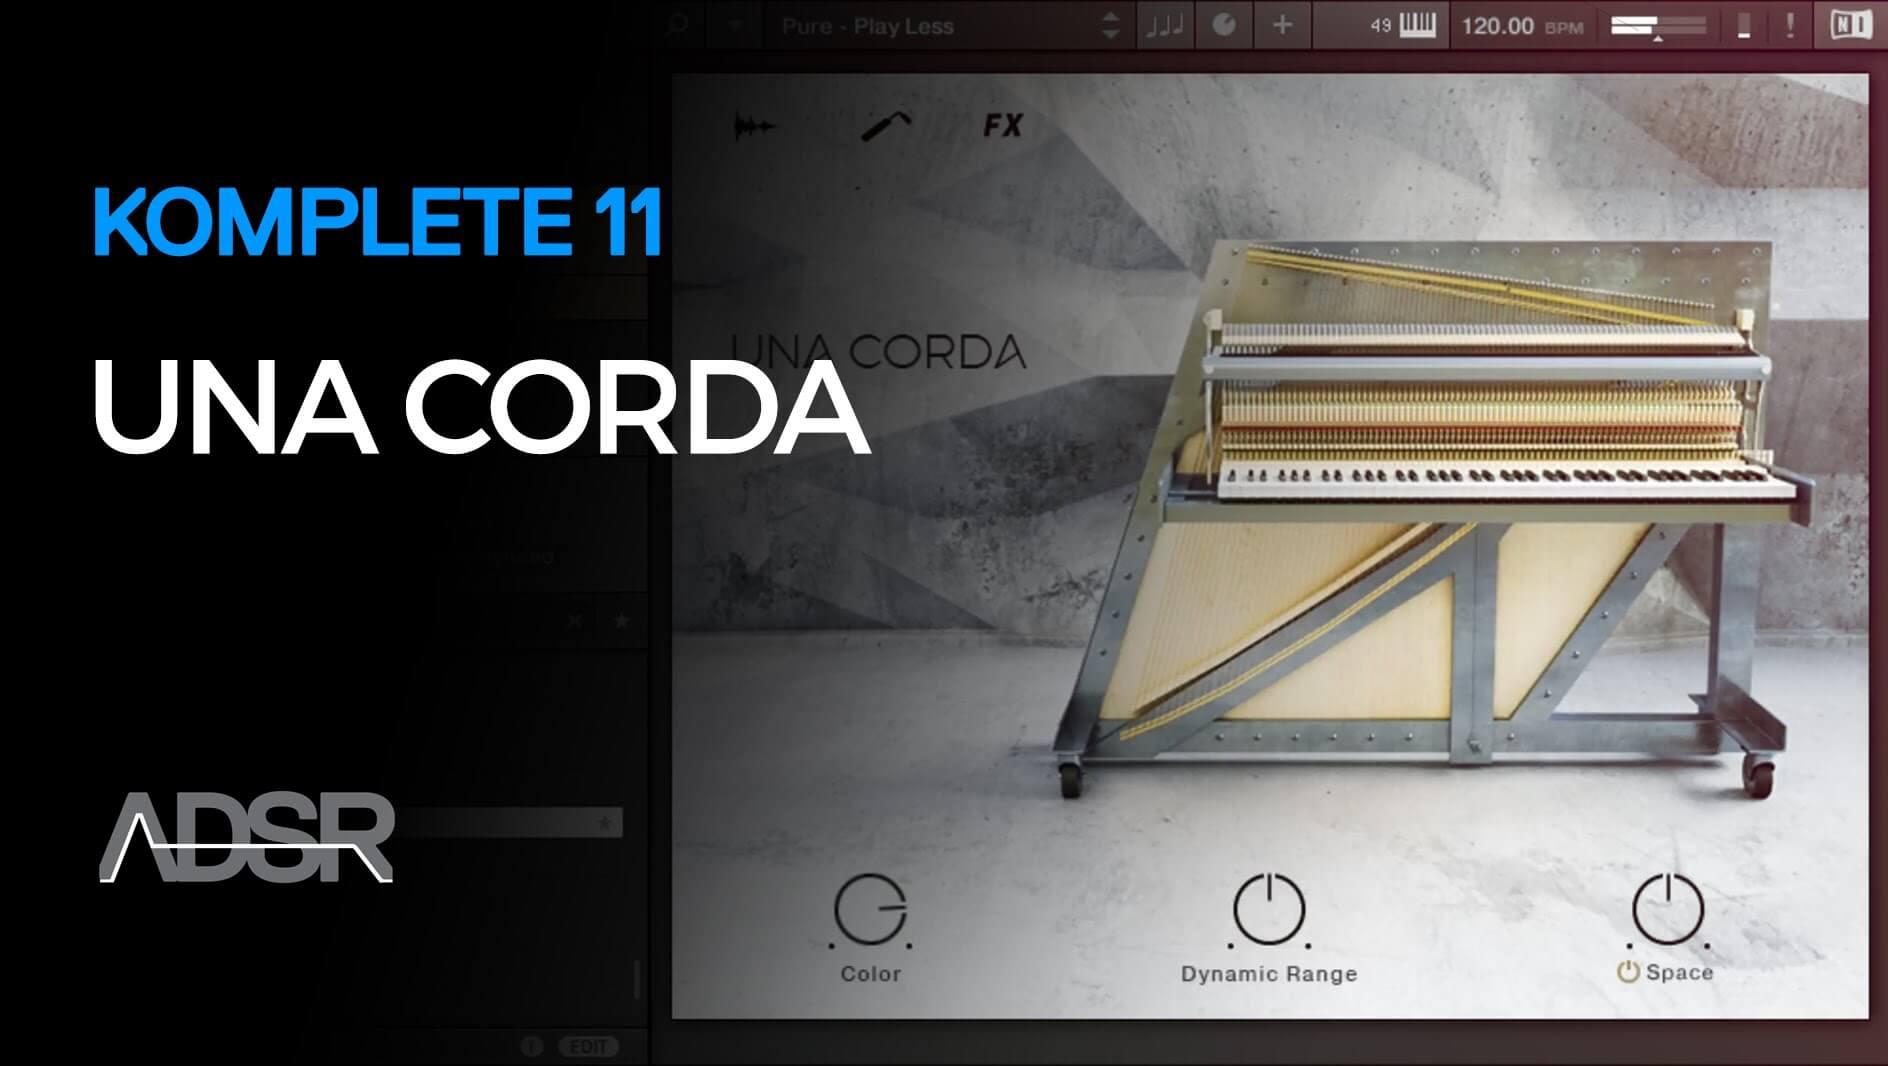 Una Corda – Komplete 11